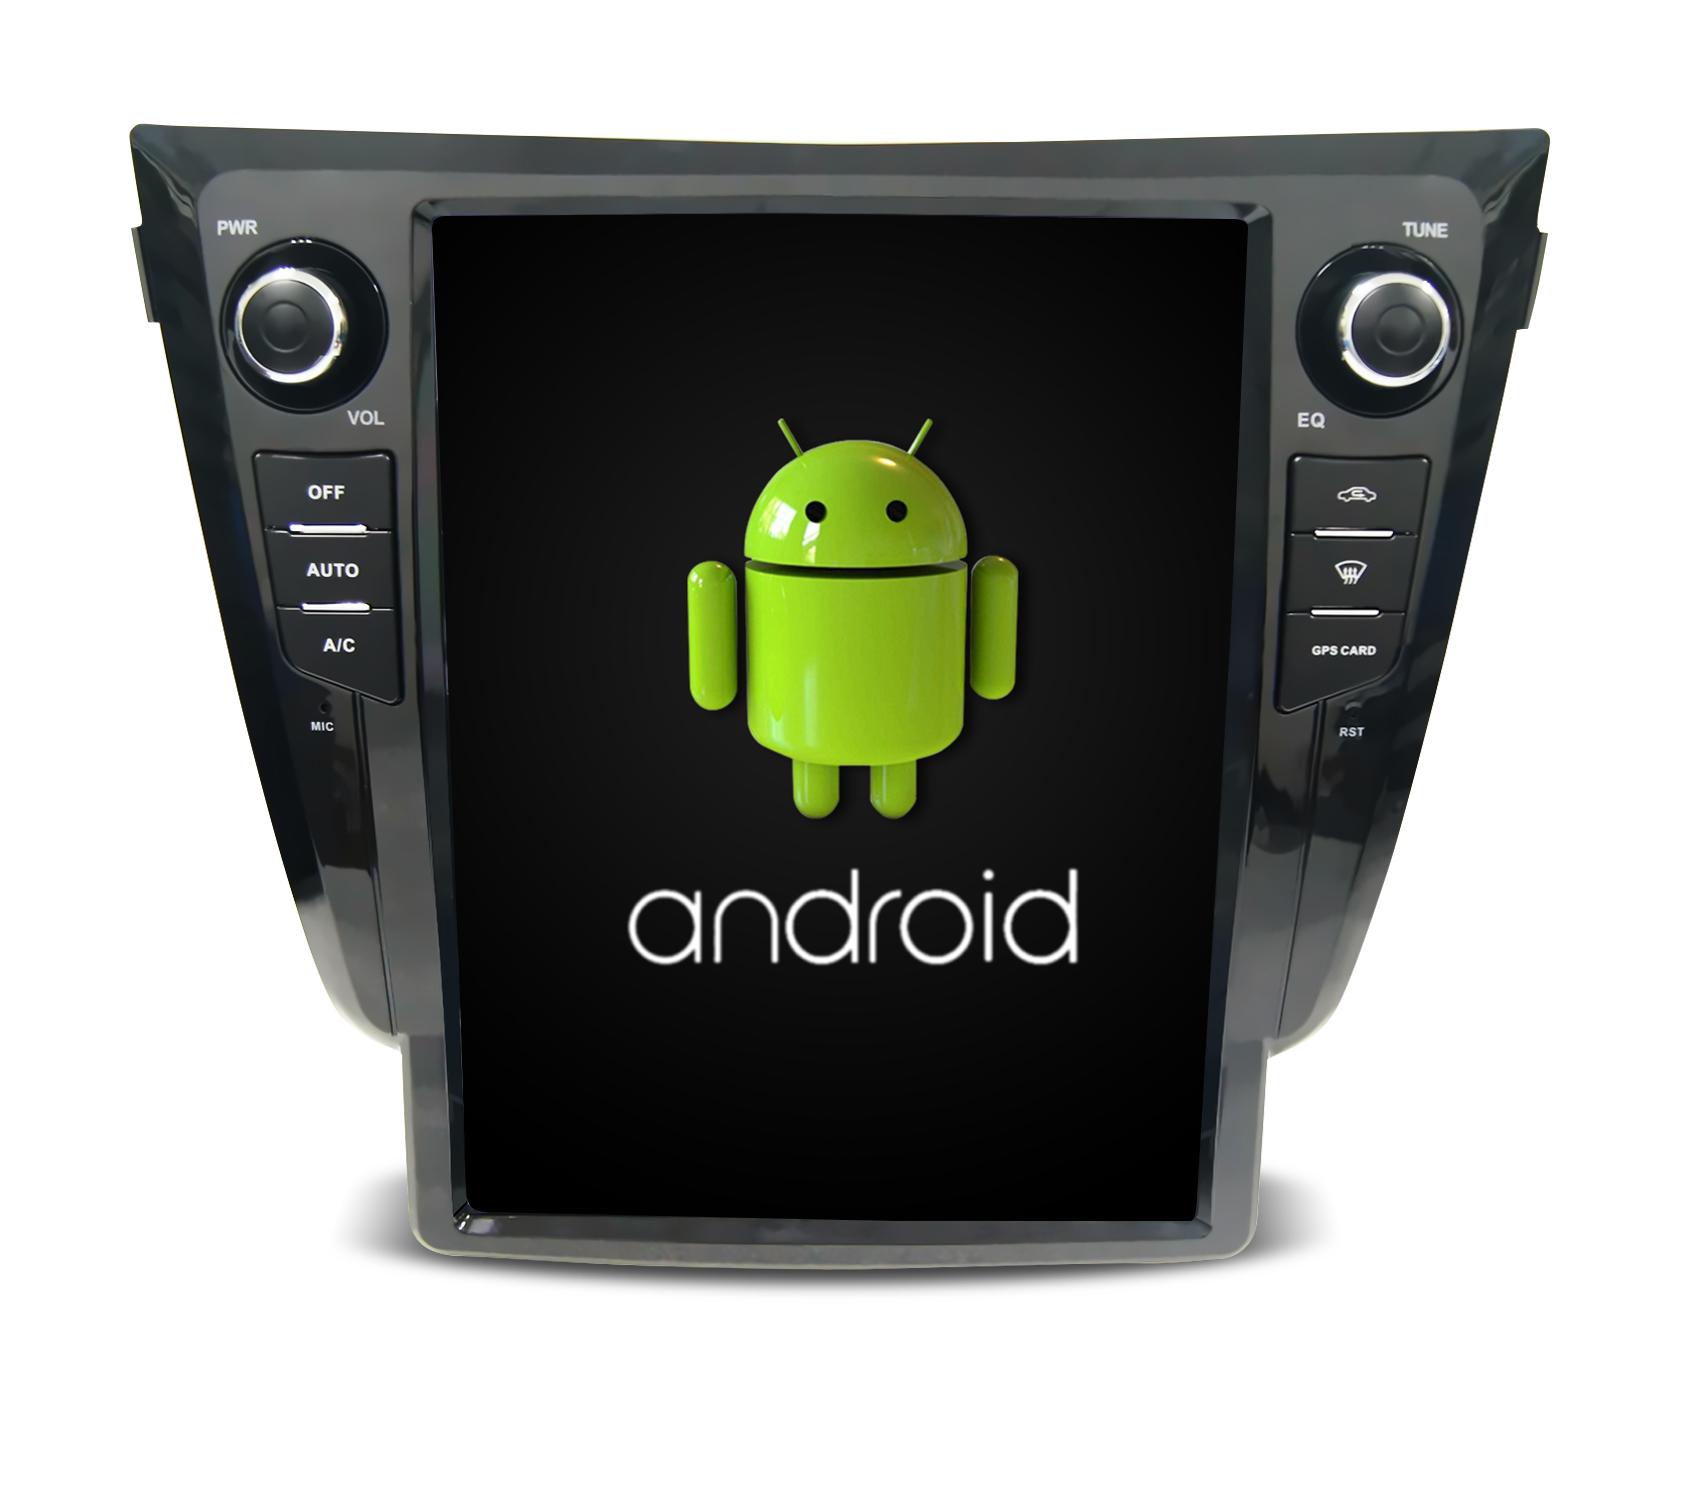 Штатная магнитола CARMEDIA SP-12106 Tesla-Style для Nissan Qashqai II 2014+, X-Trail 2015+ (T32) Android 7.1.2 vivibright gp90 lcd projector 3200 lumens android 4 44 os